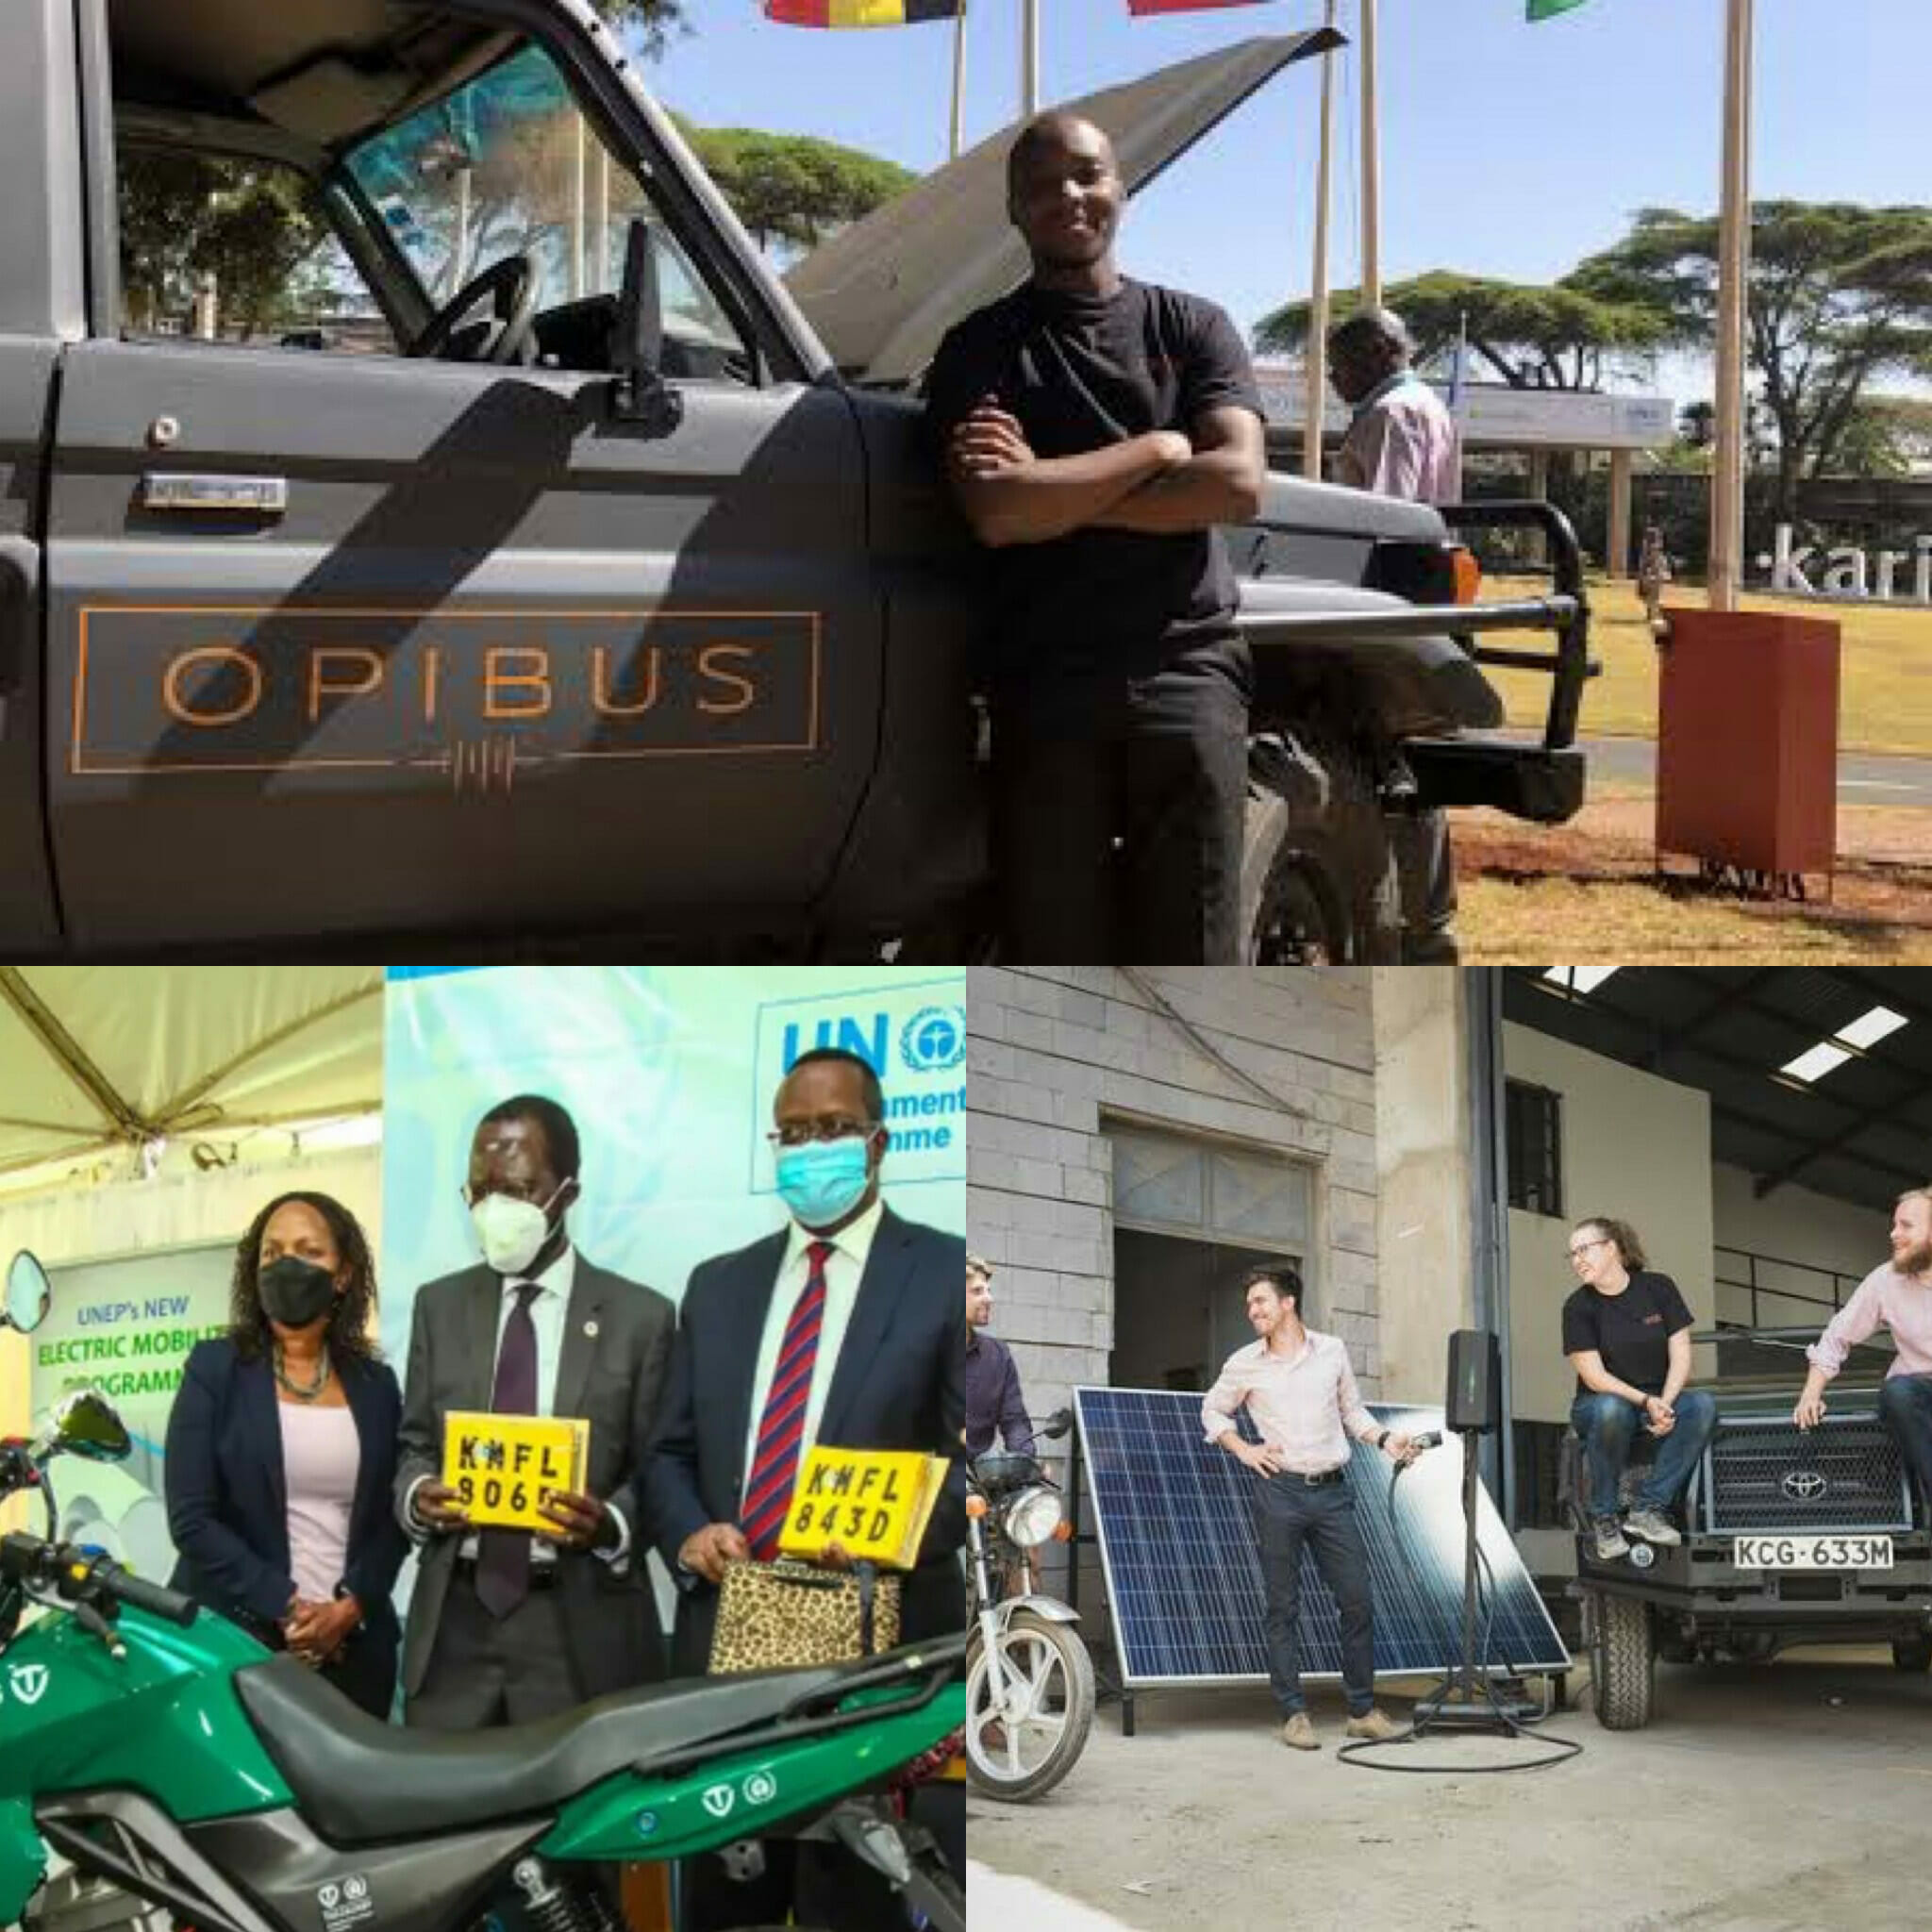 EV化に力を入れるケニア「Opibus社」